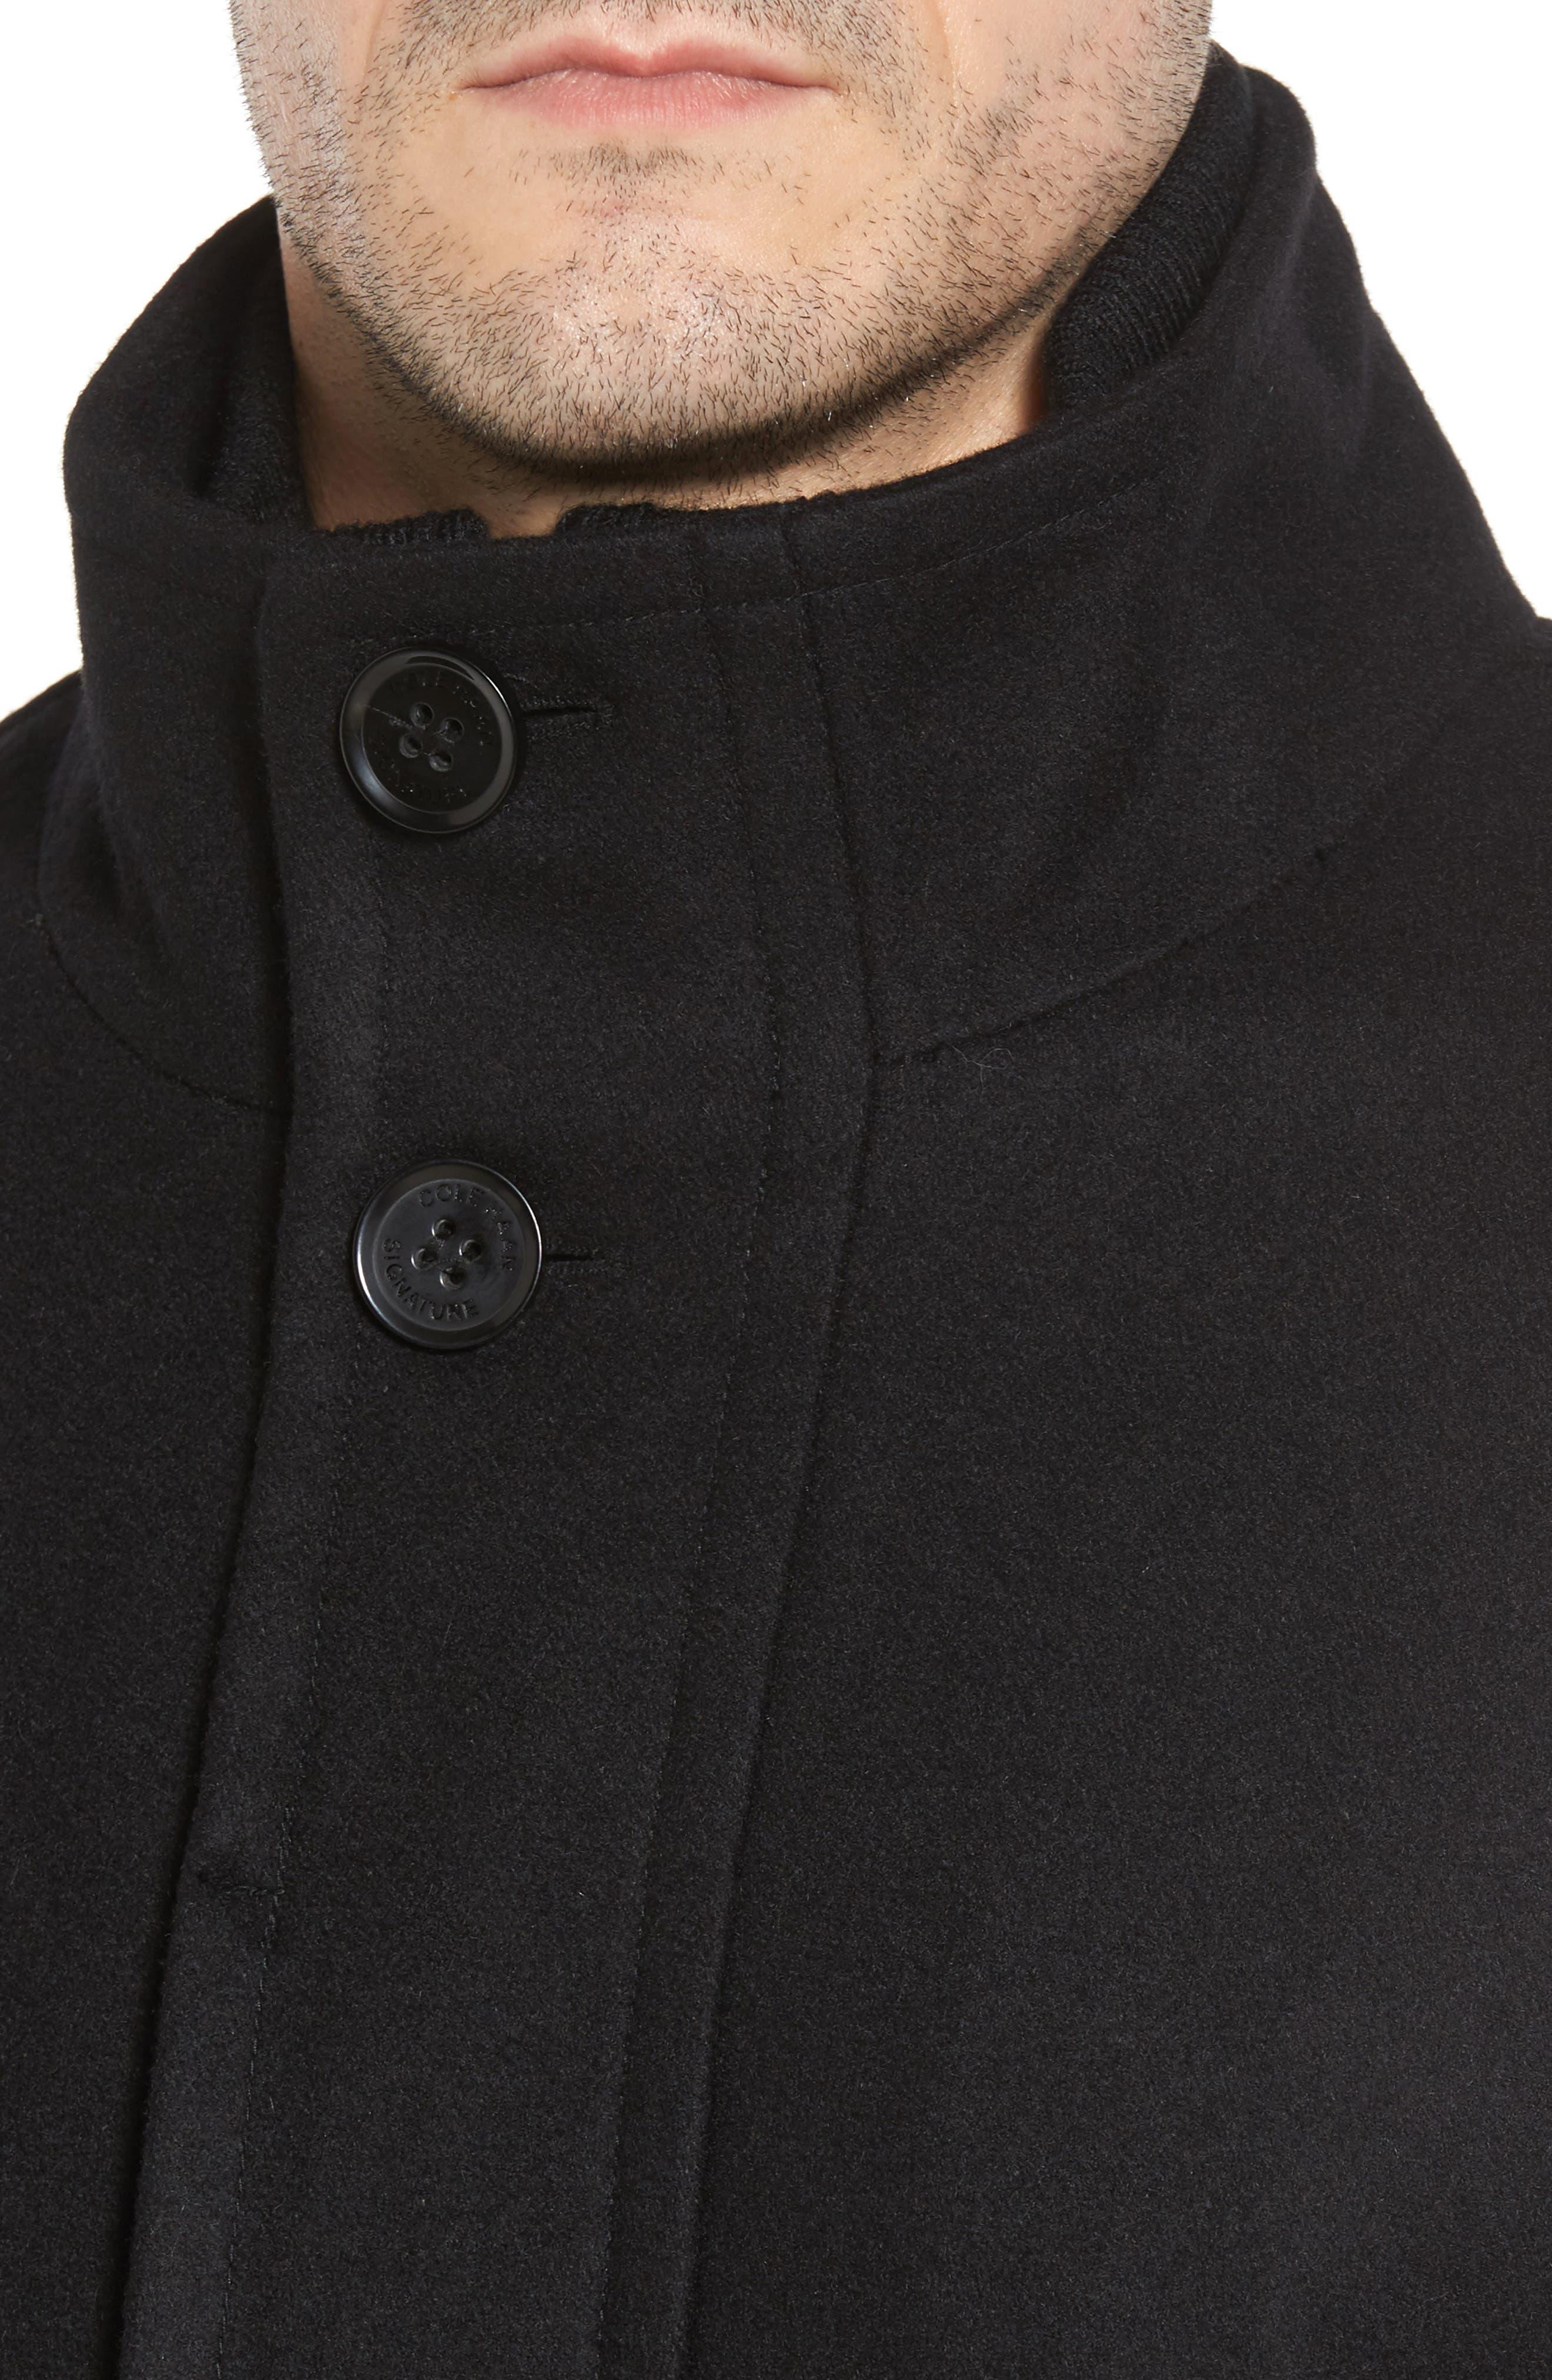 Melton Wool Blend Coat,                             Alternate thumbnail 4, color,                             Black